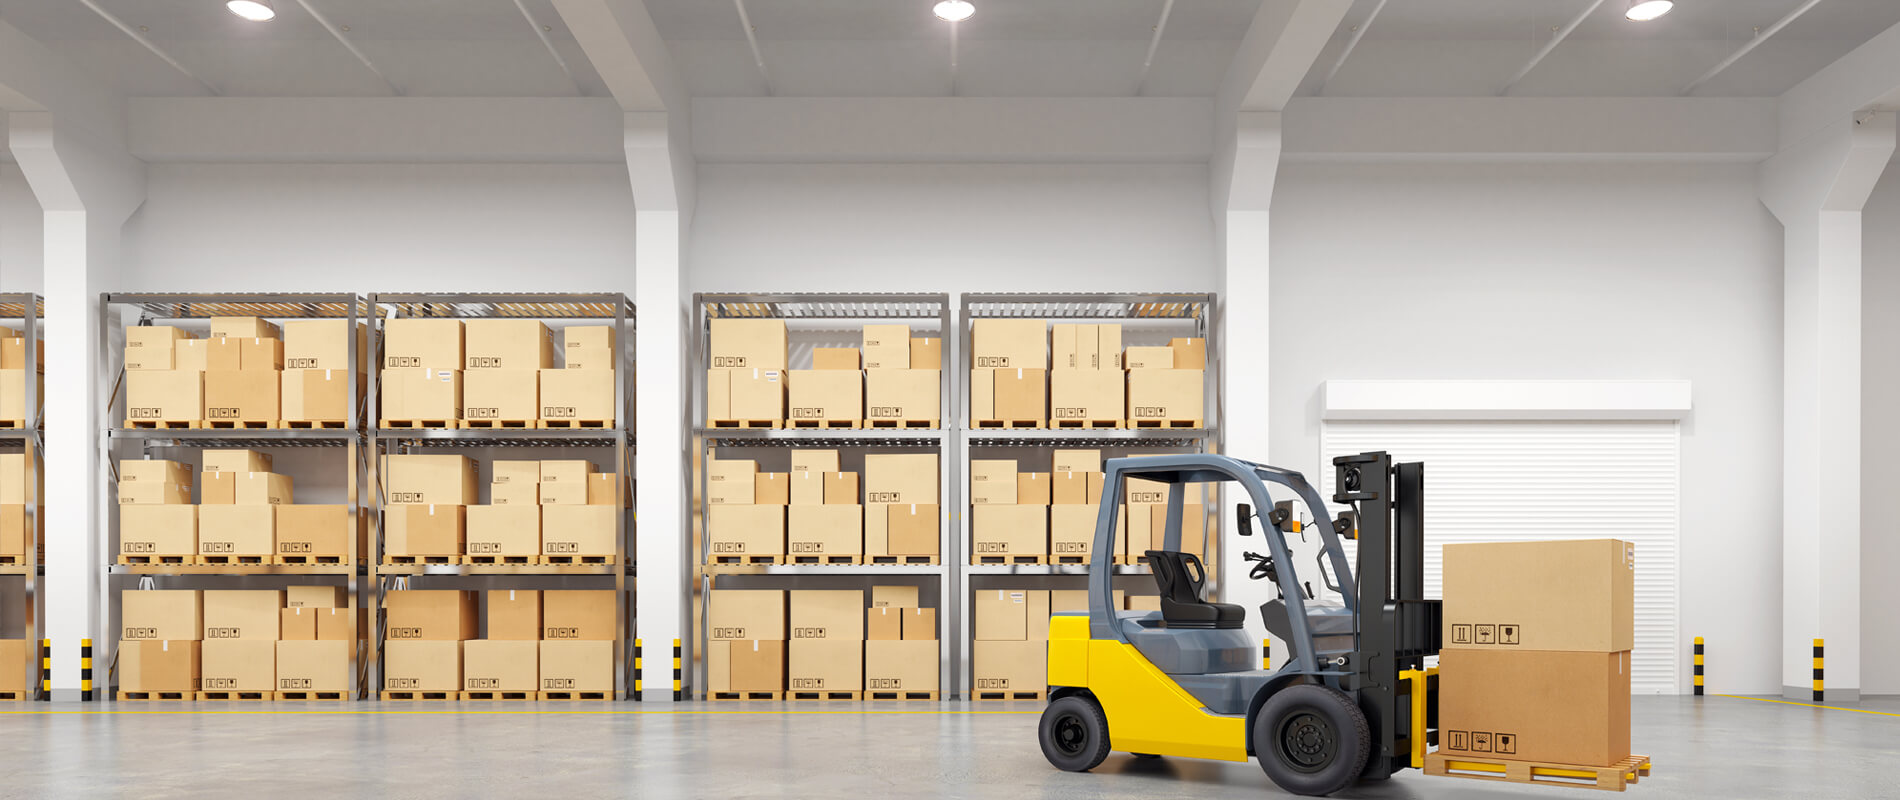 HiBoost Enjoy Better signal -Warehouse